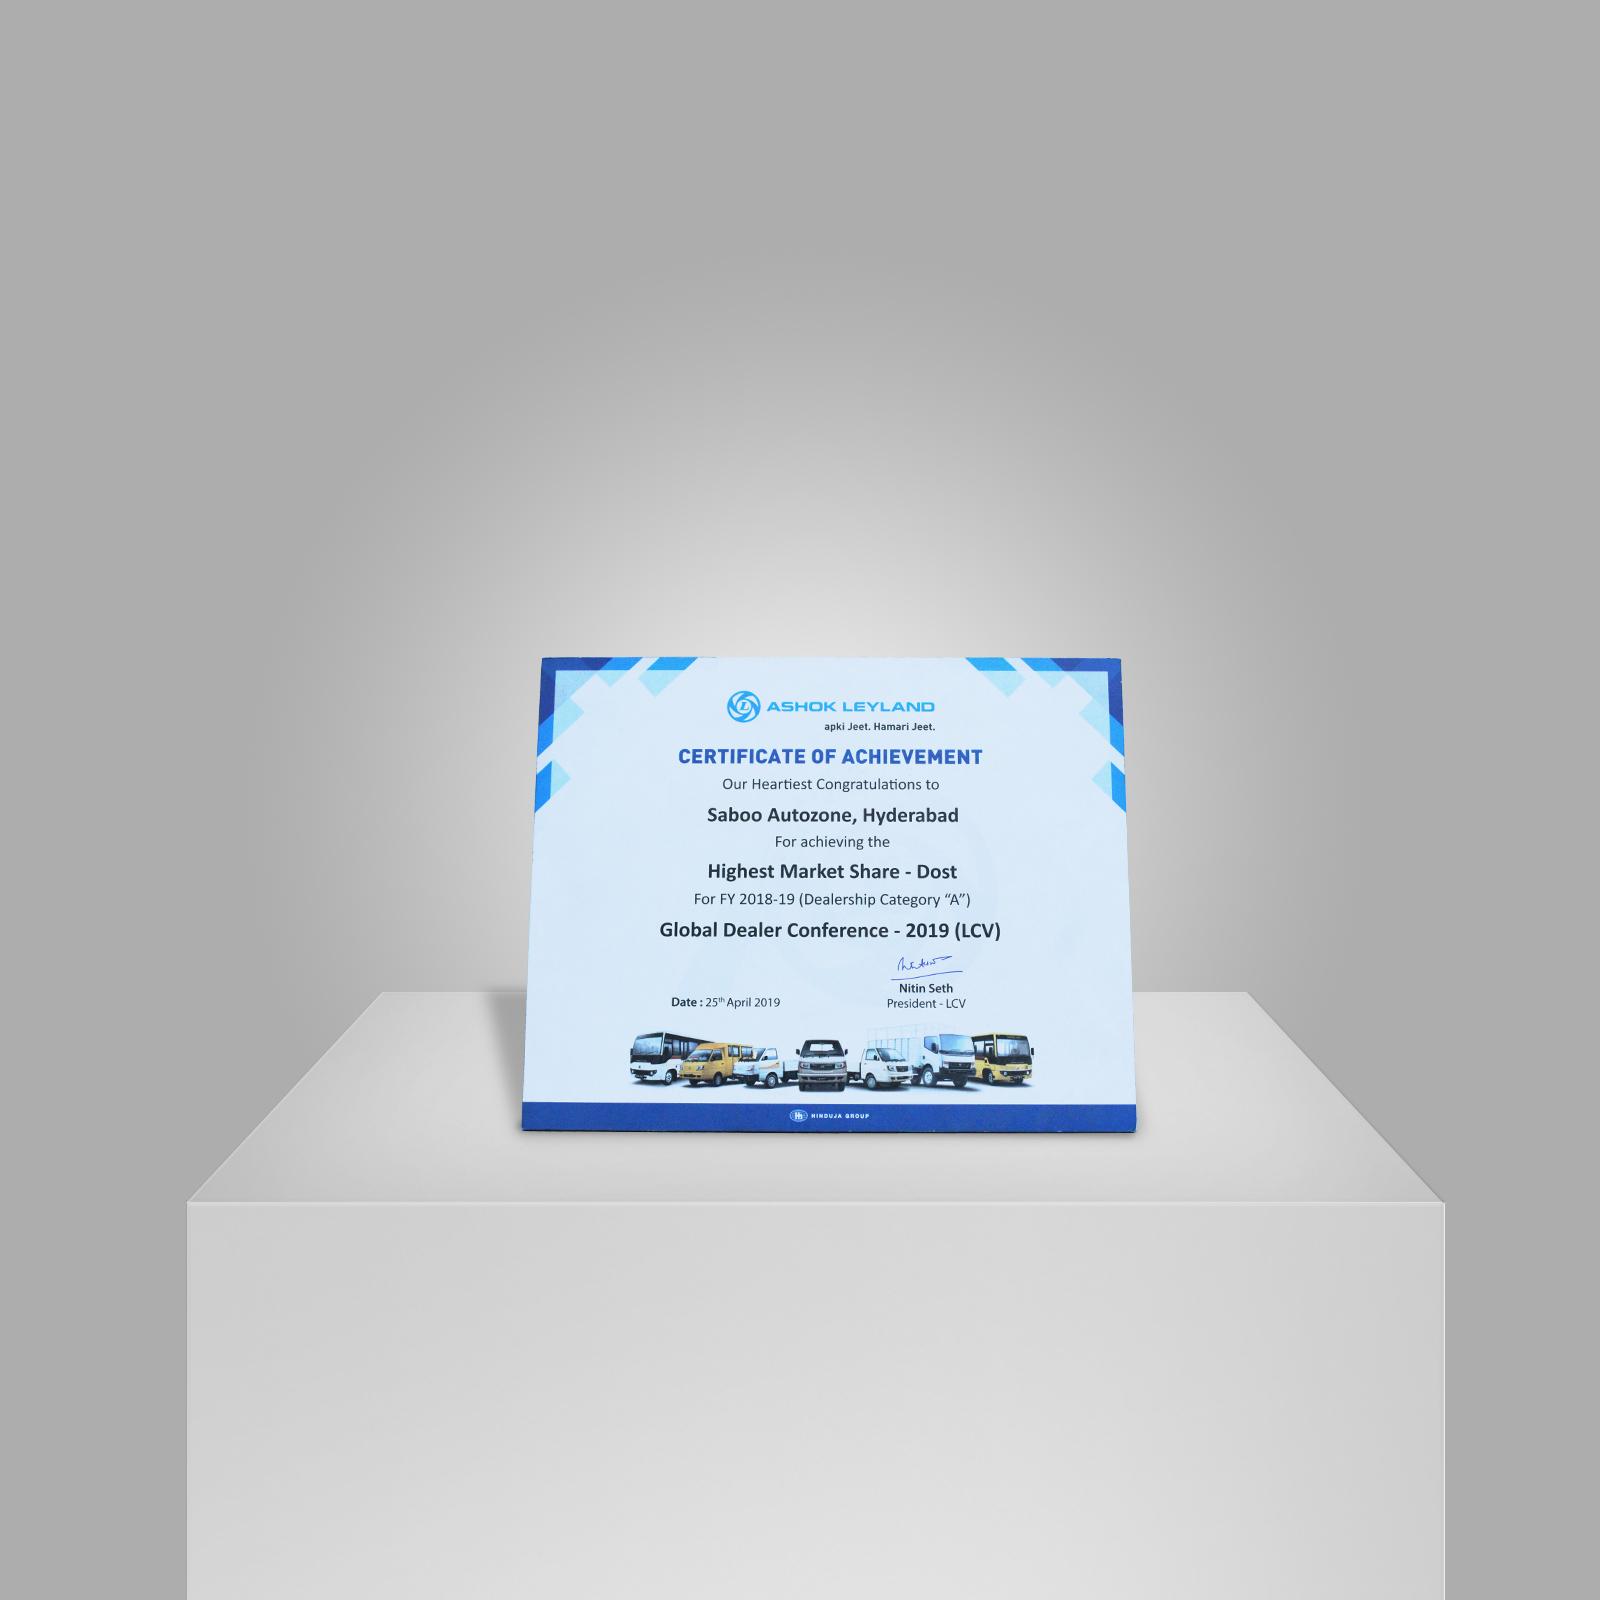 Certification-of-Achievement-Highest-Market-Share-Dost-Award-from-Ashok-Leyland